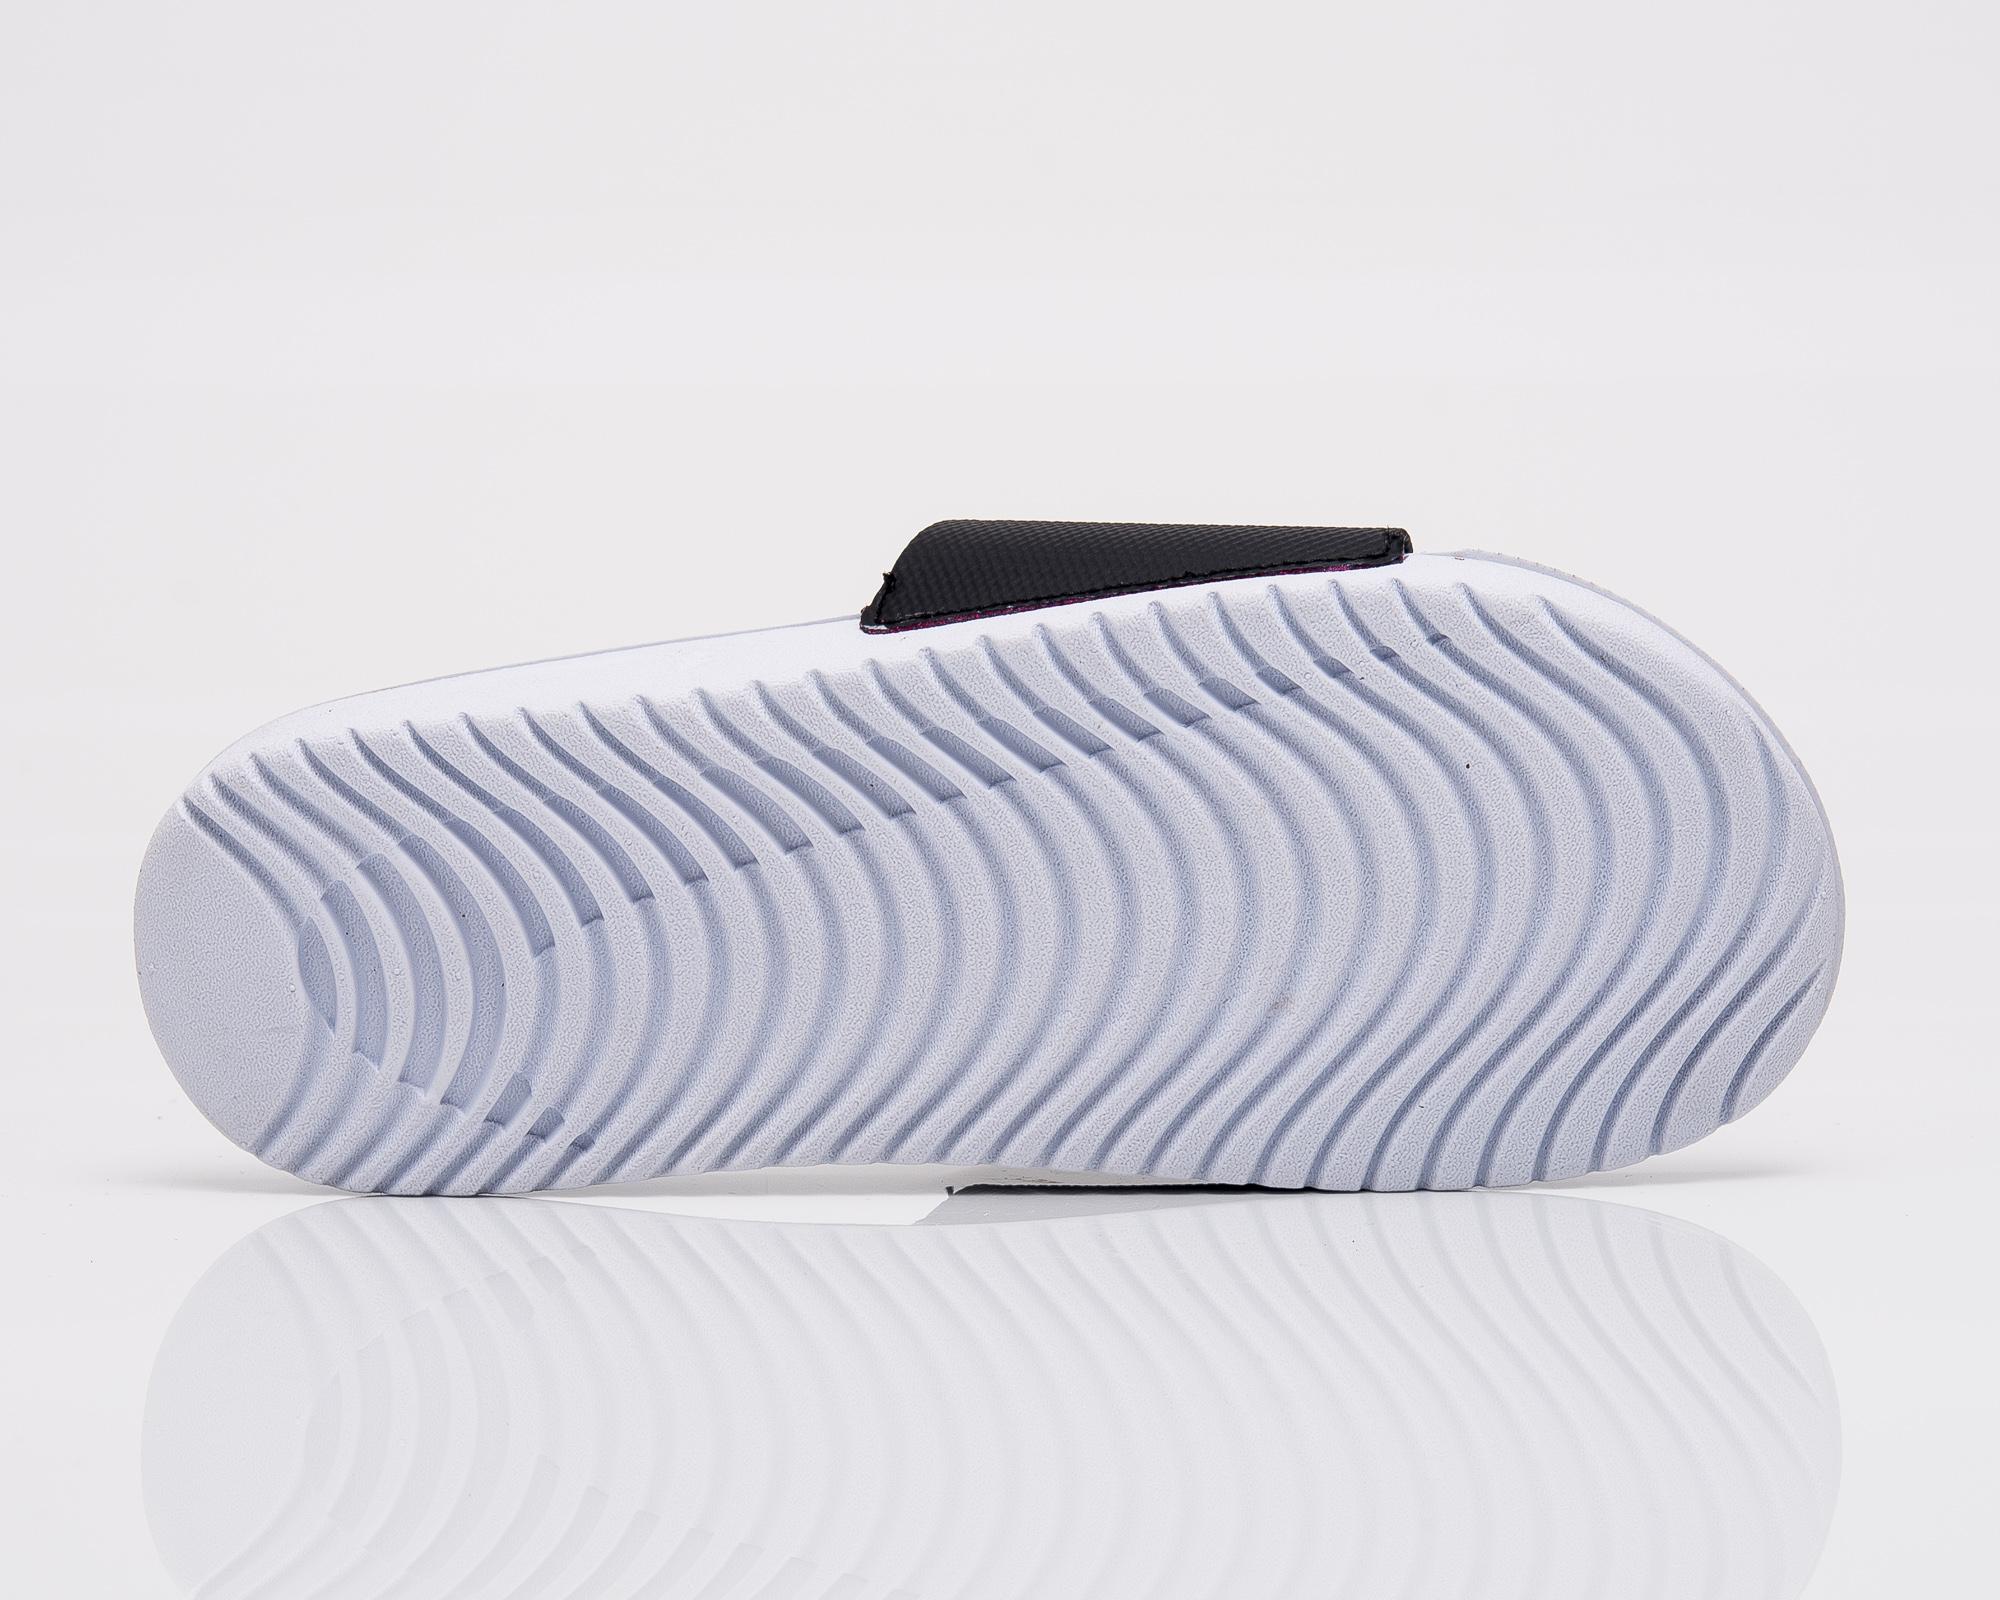 65c849073efe12 Nike Wmns Kawa Slide - Shoes Slides - Sporting goods